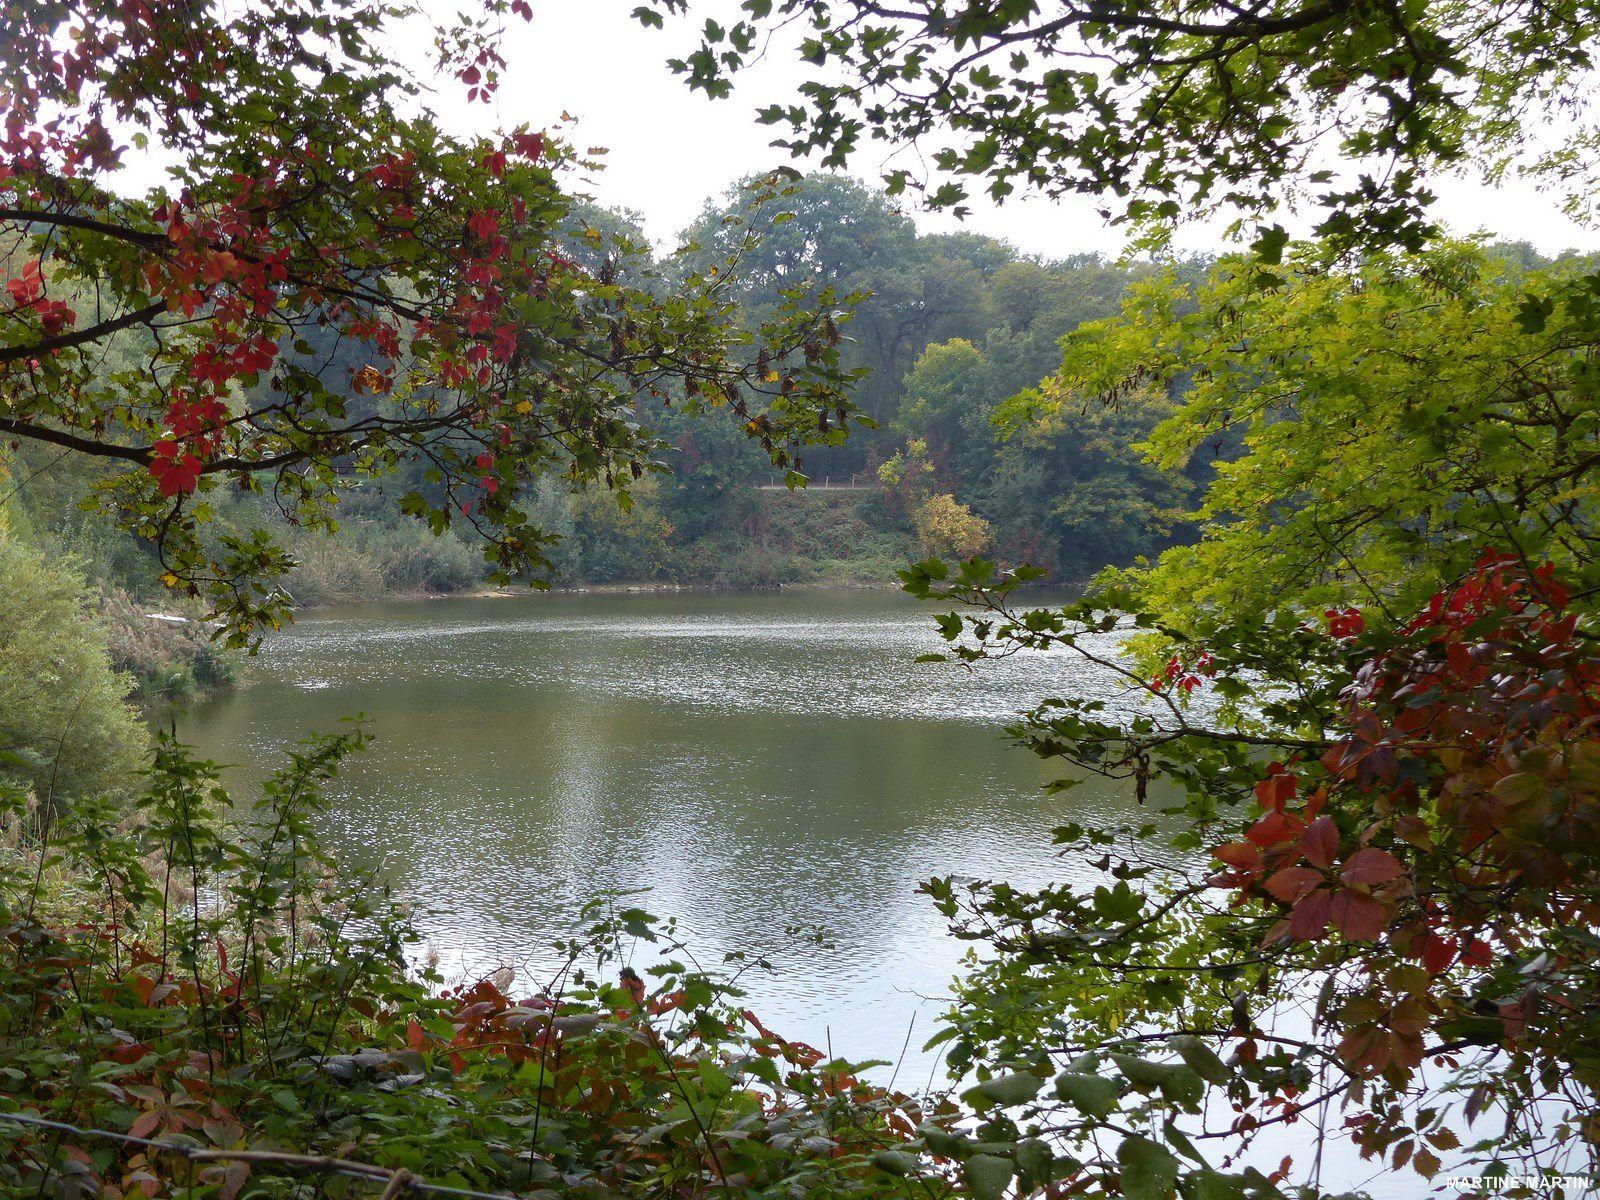 L'étang du Corra en forêt de Saint Germain